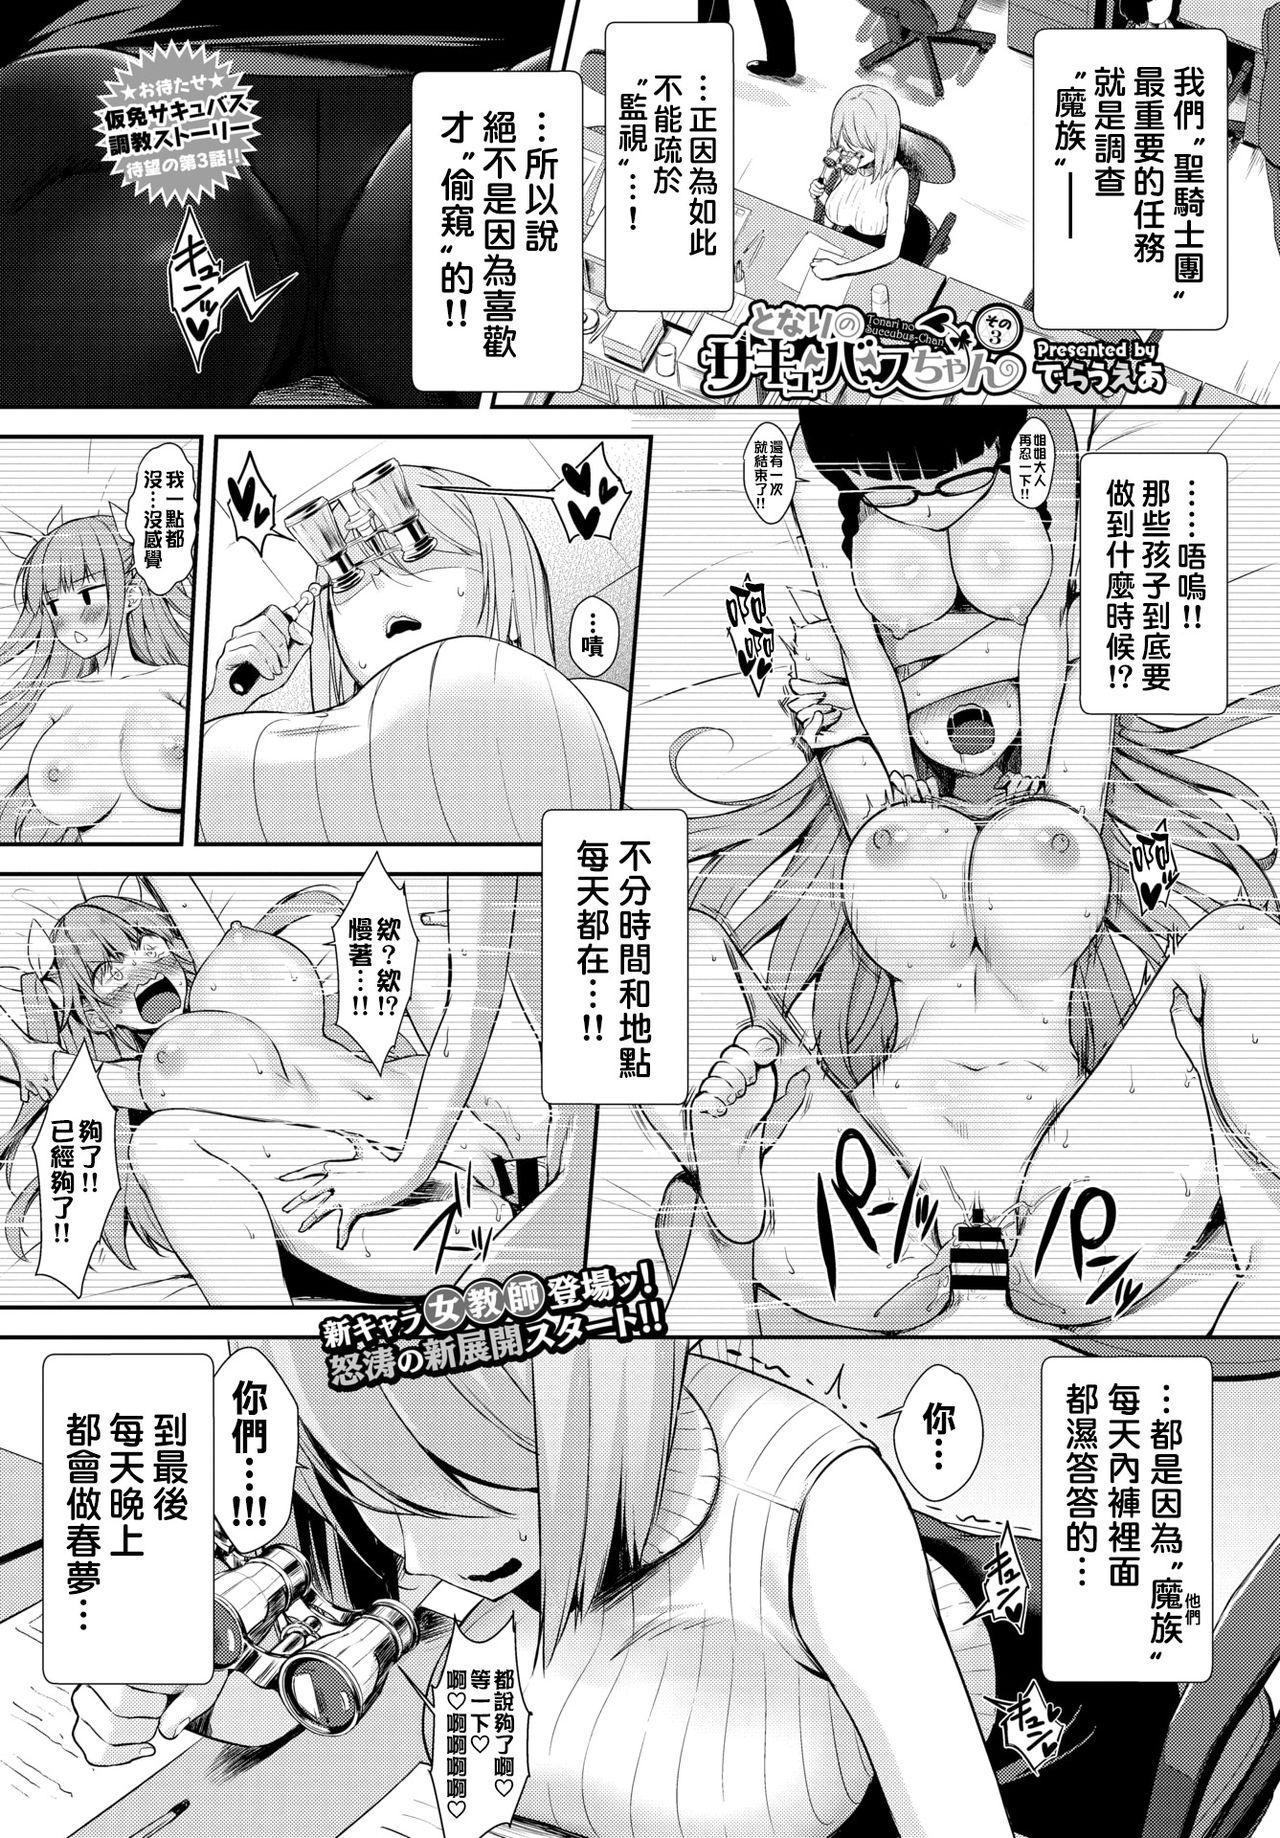 [Derauea] Tonari no Succubus-chan Ch. 1-3 [Chinese] [therethere個人翻譯&嵌字] [Digital] 47